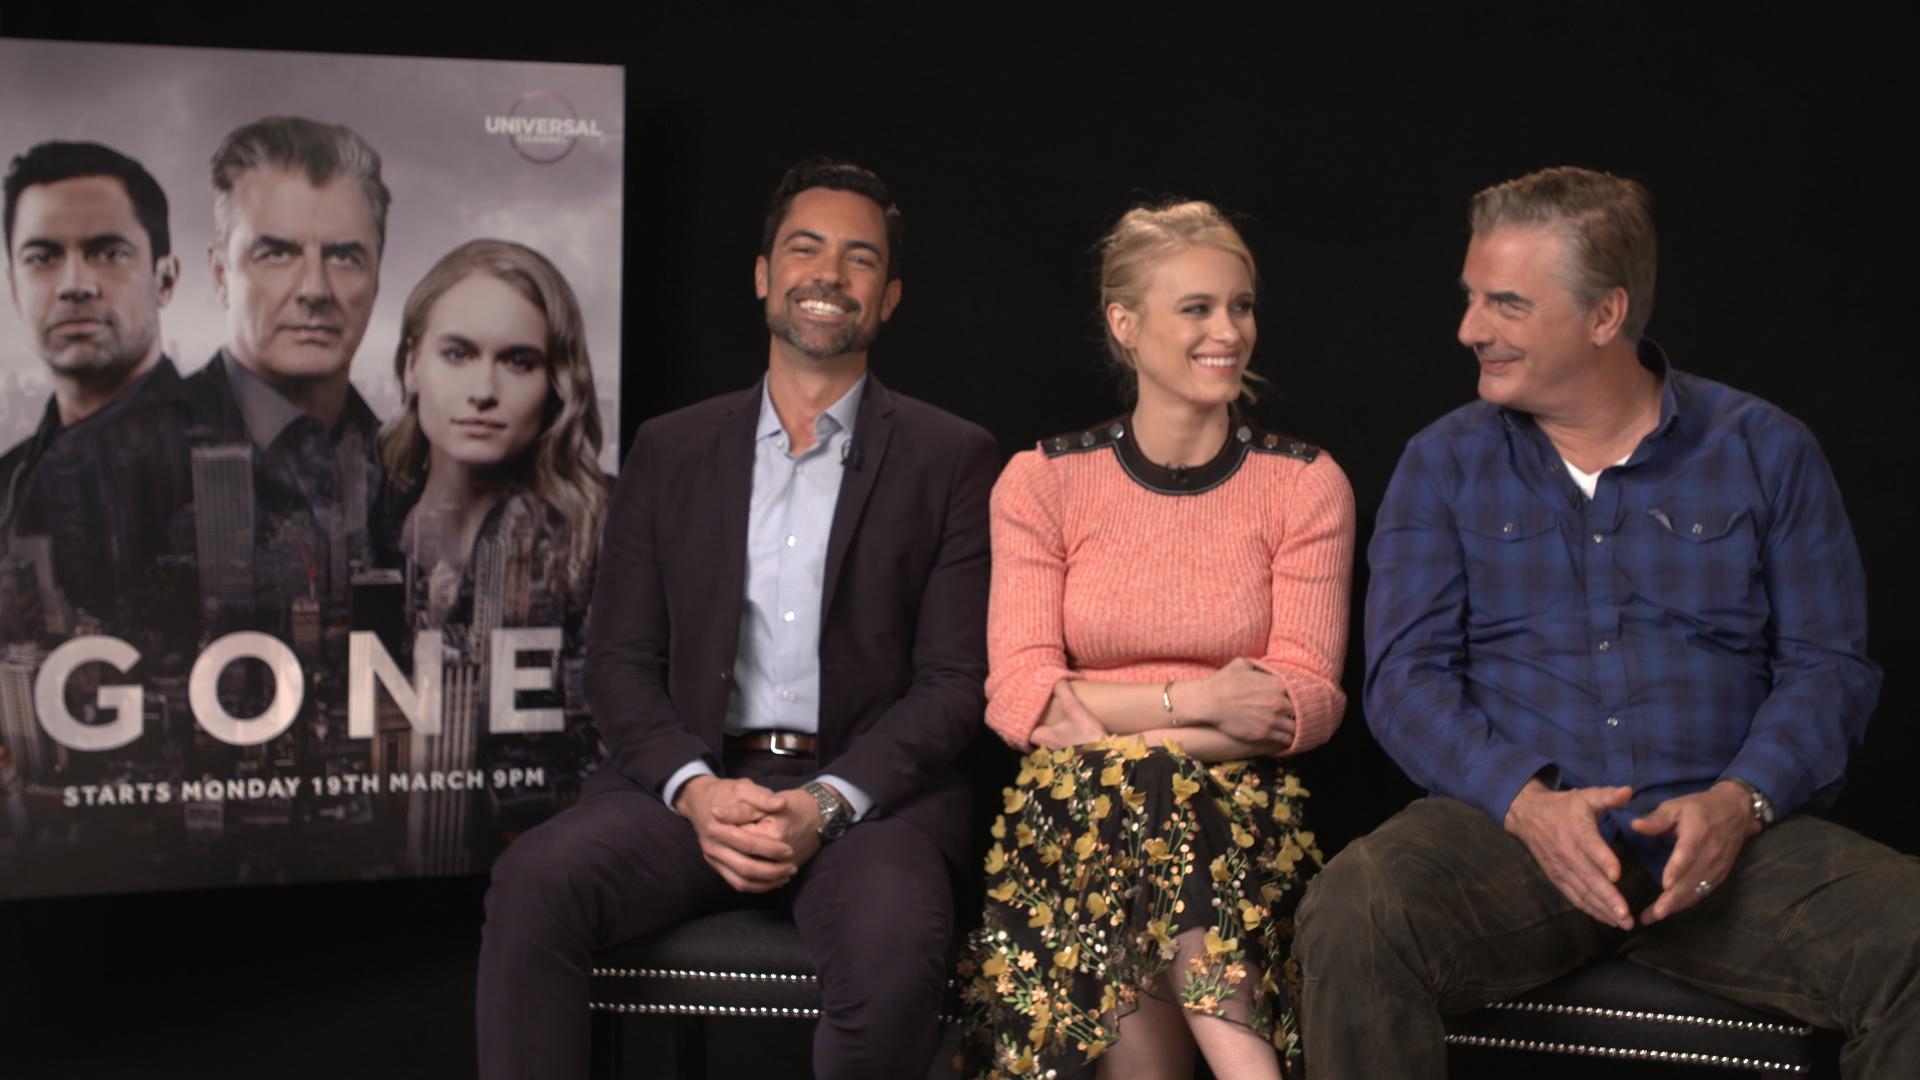 gone cast interviews